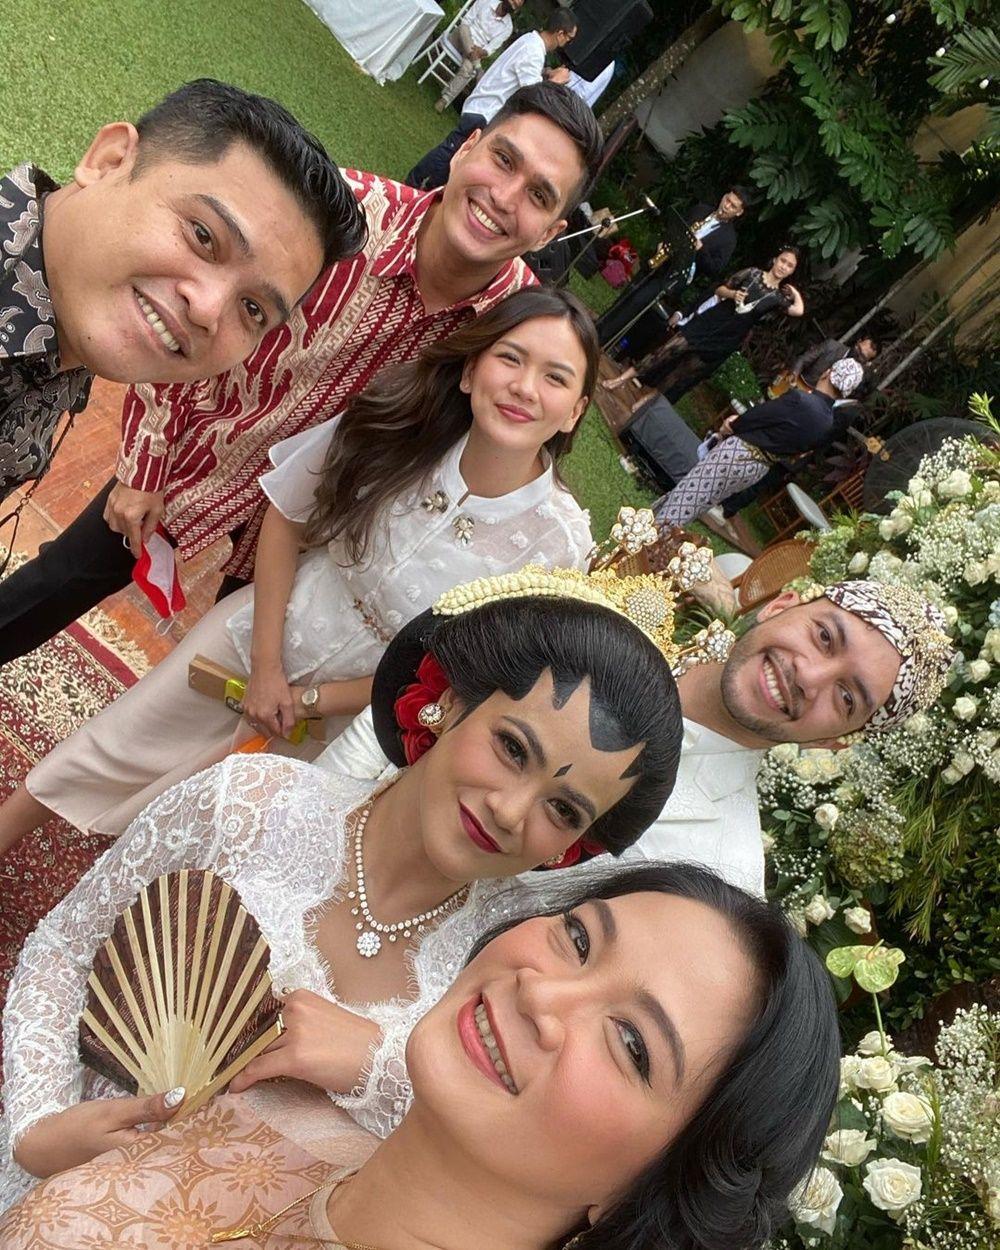 Balikan Sama Mantan, 9 Potret Perjalanan Cinta Indah Indriana & Suami